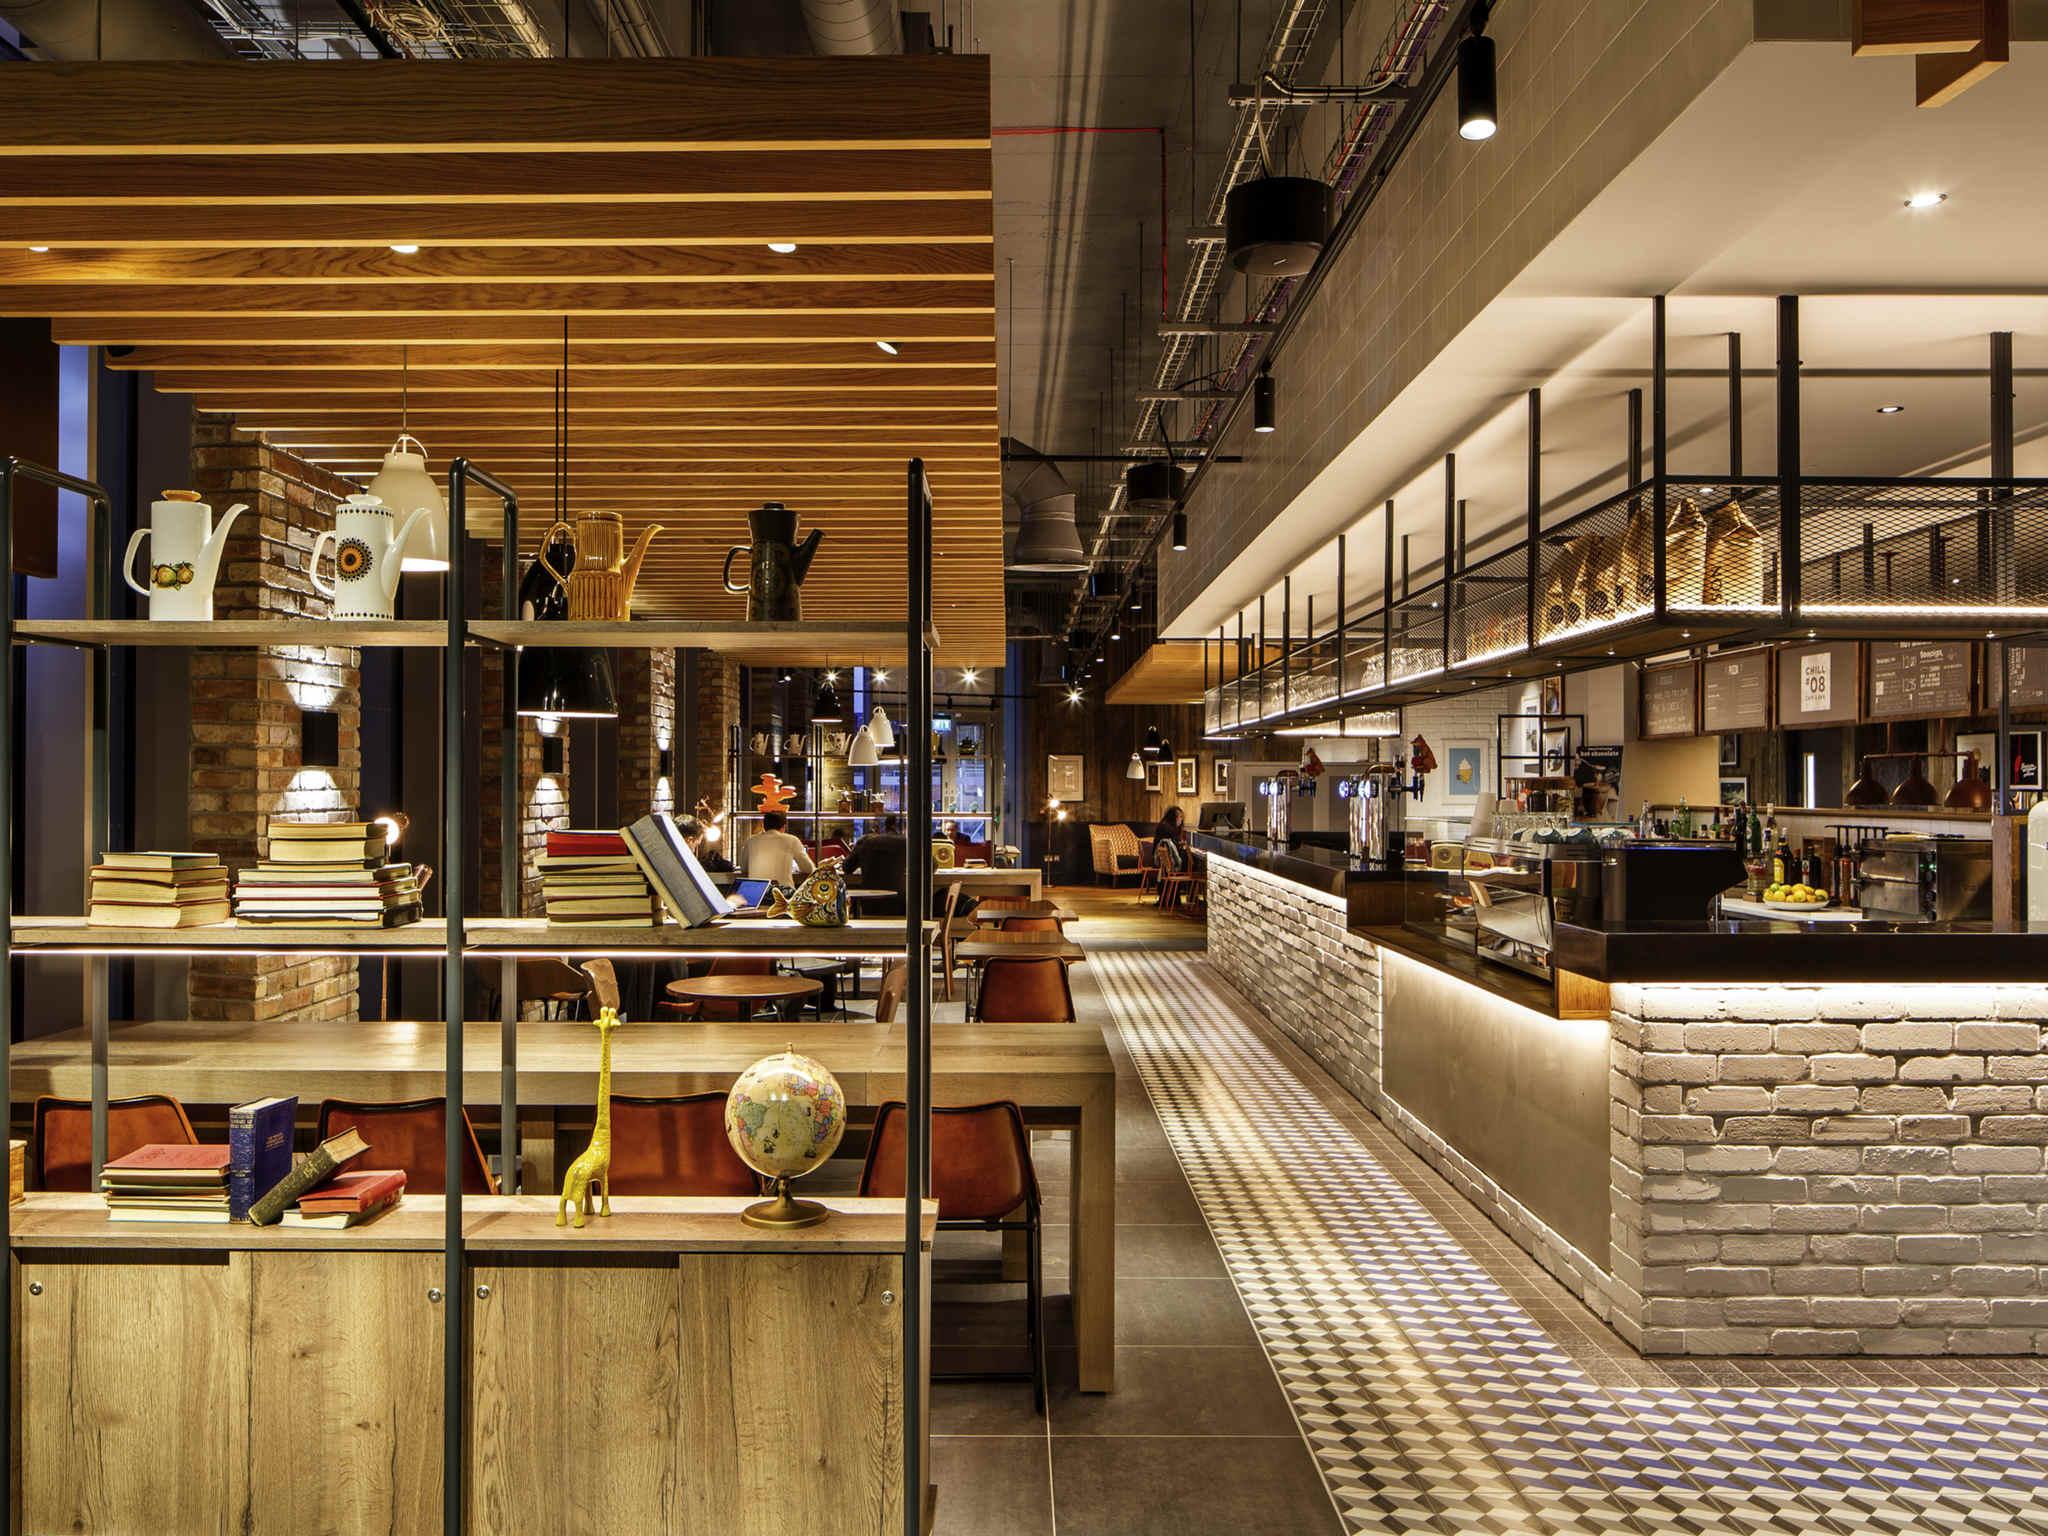 Hotel – ibis London Canning Town (otwarcie w listopadzie 2017)